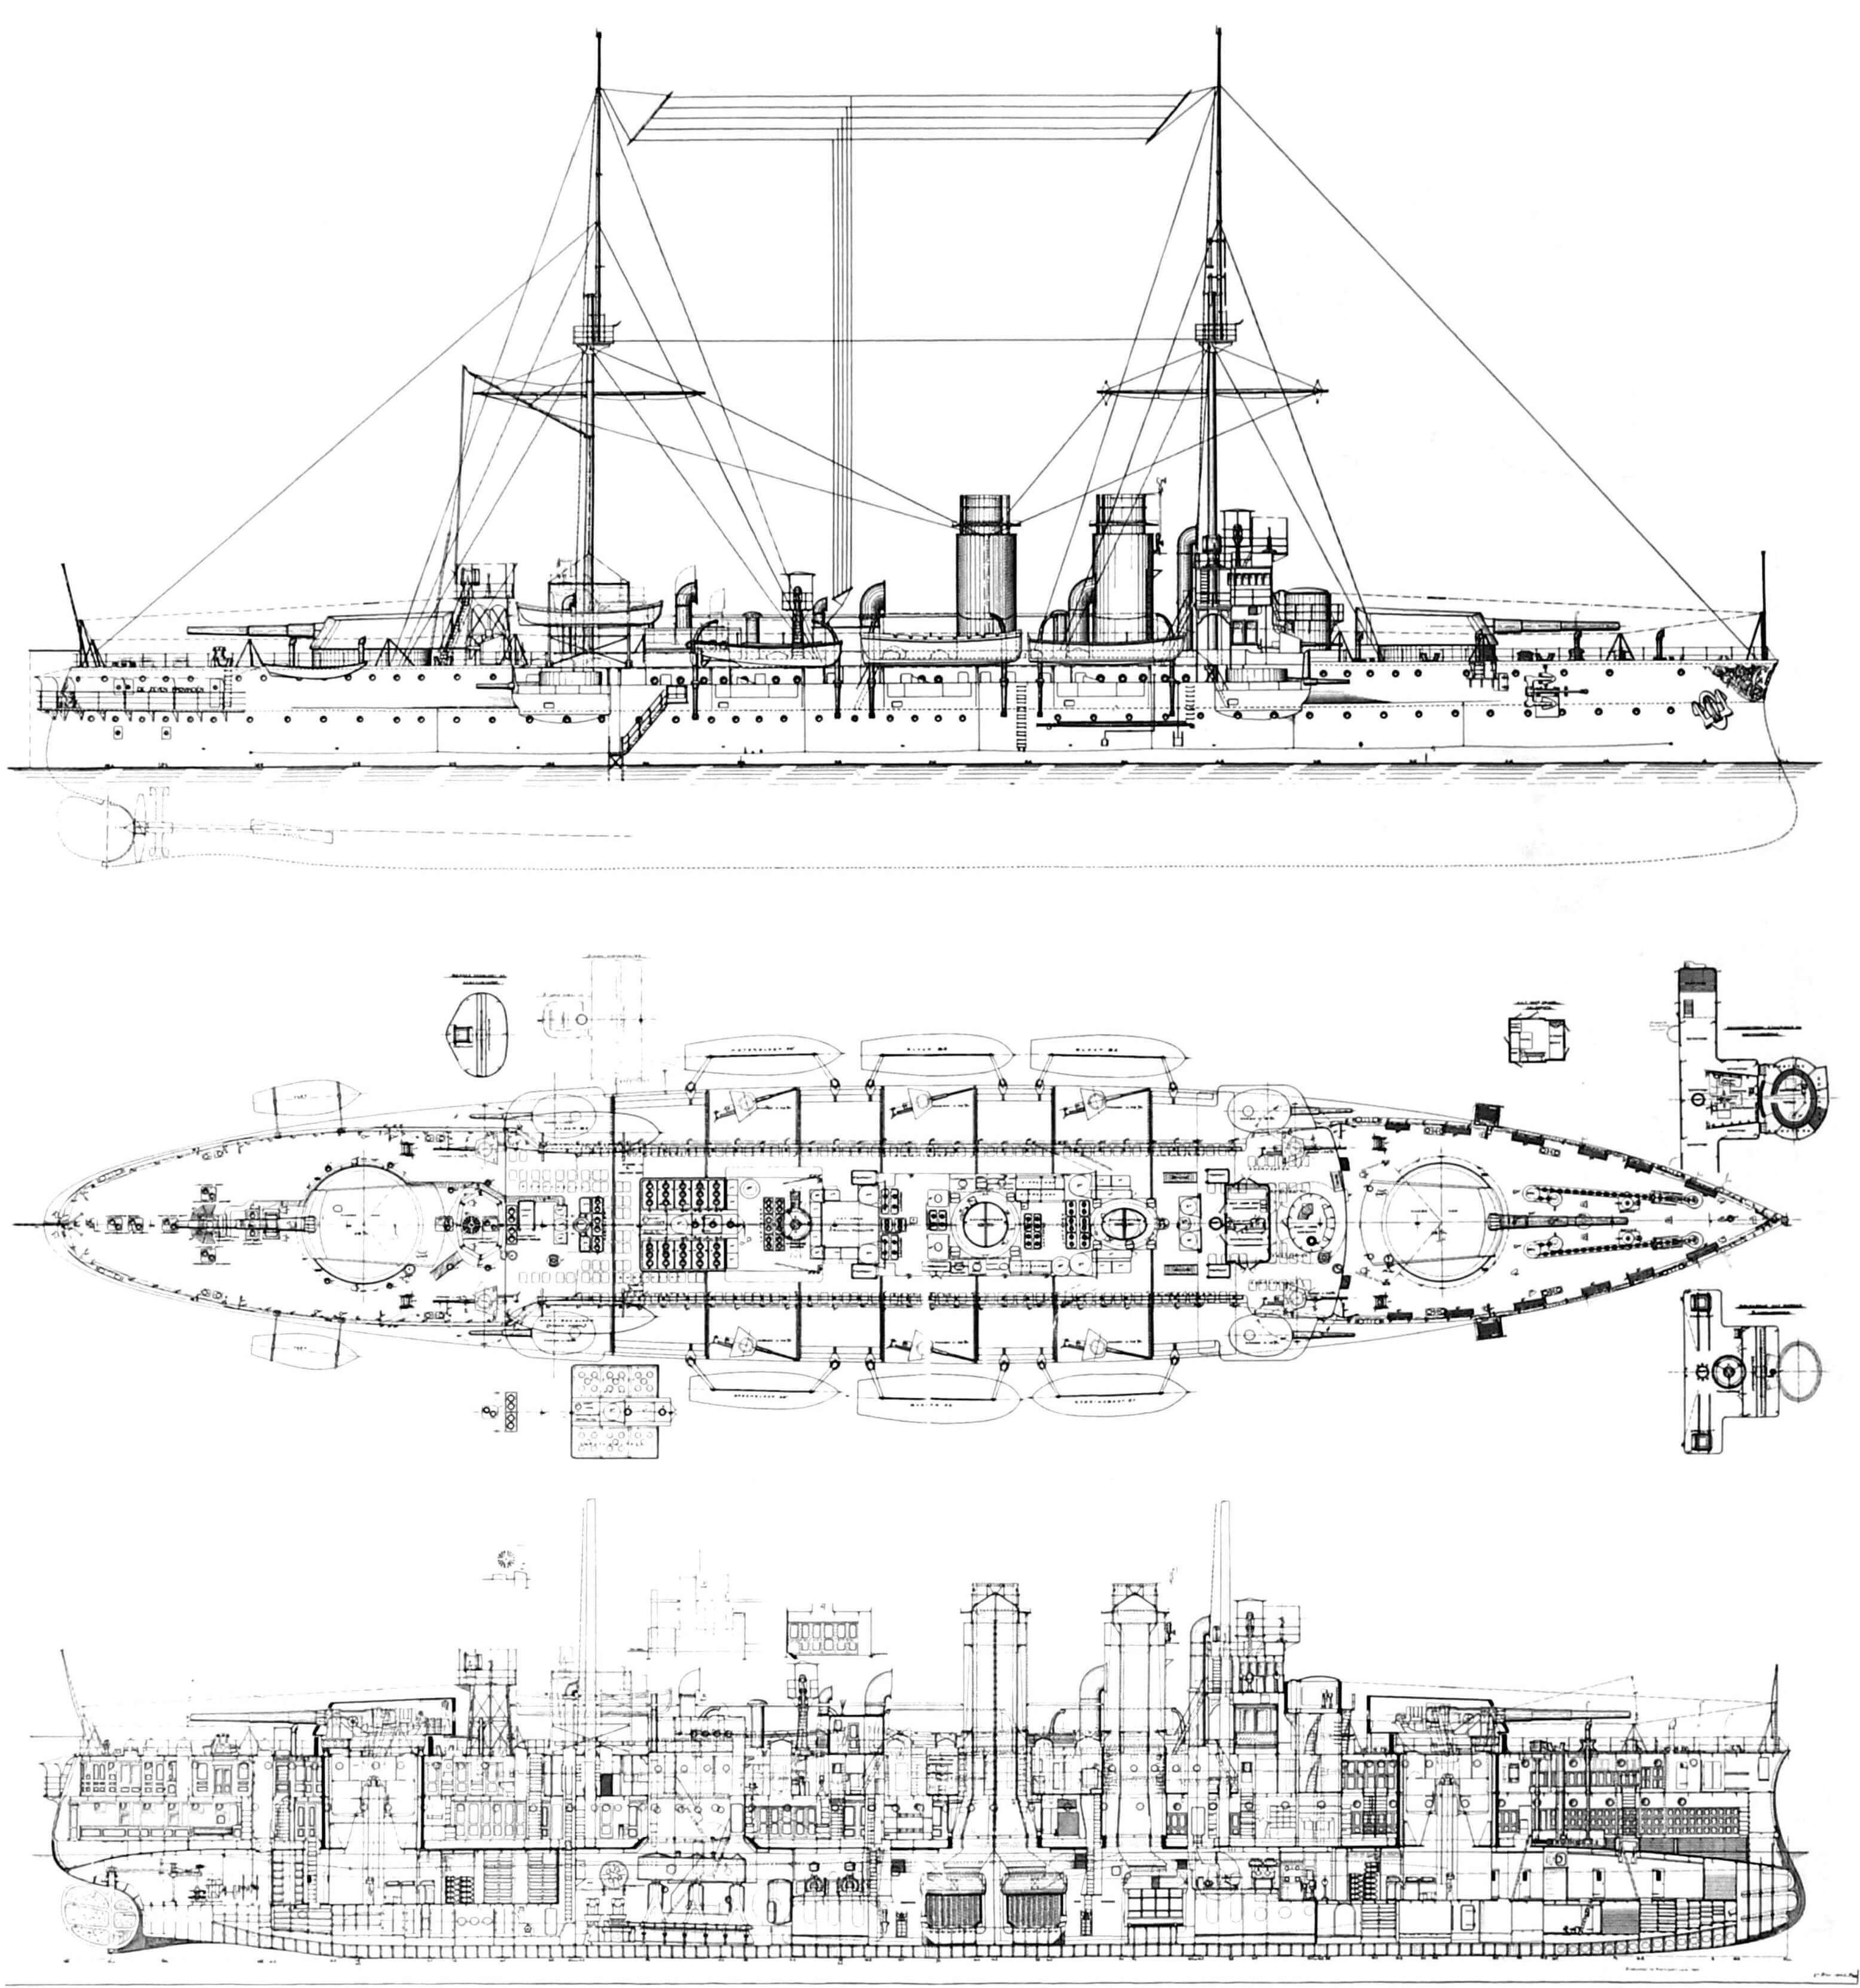 Броненосец береговой обороны «Де Зевен Провинсиен»